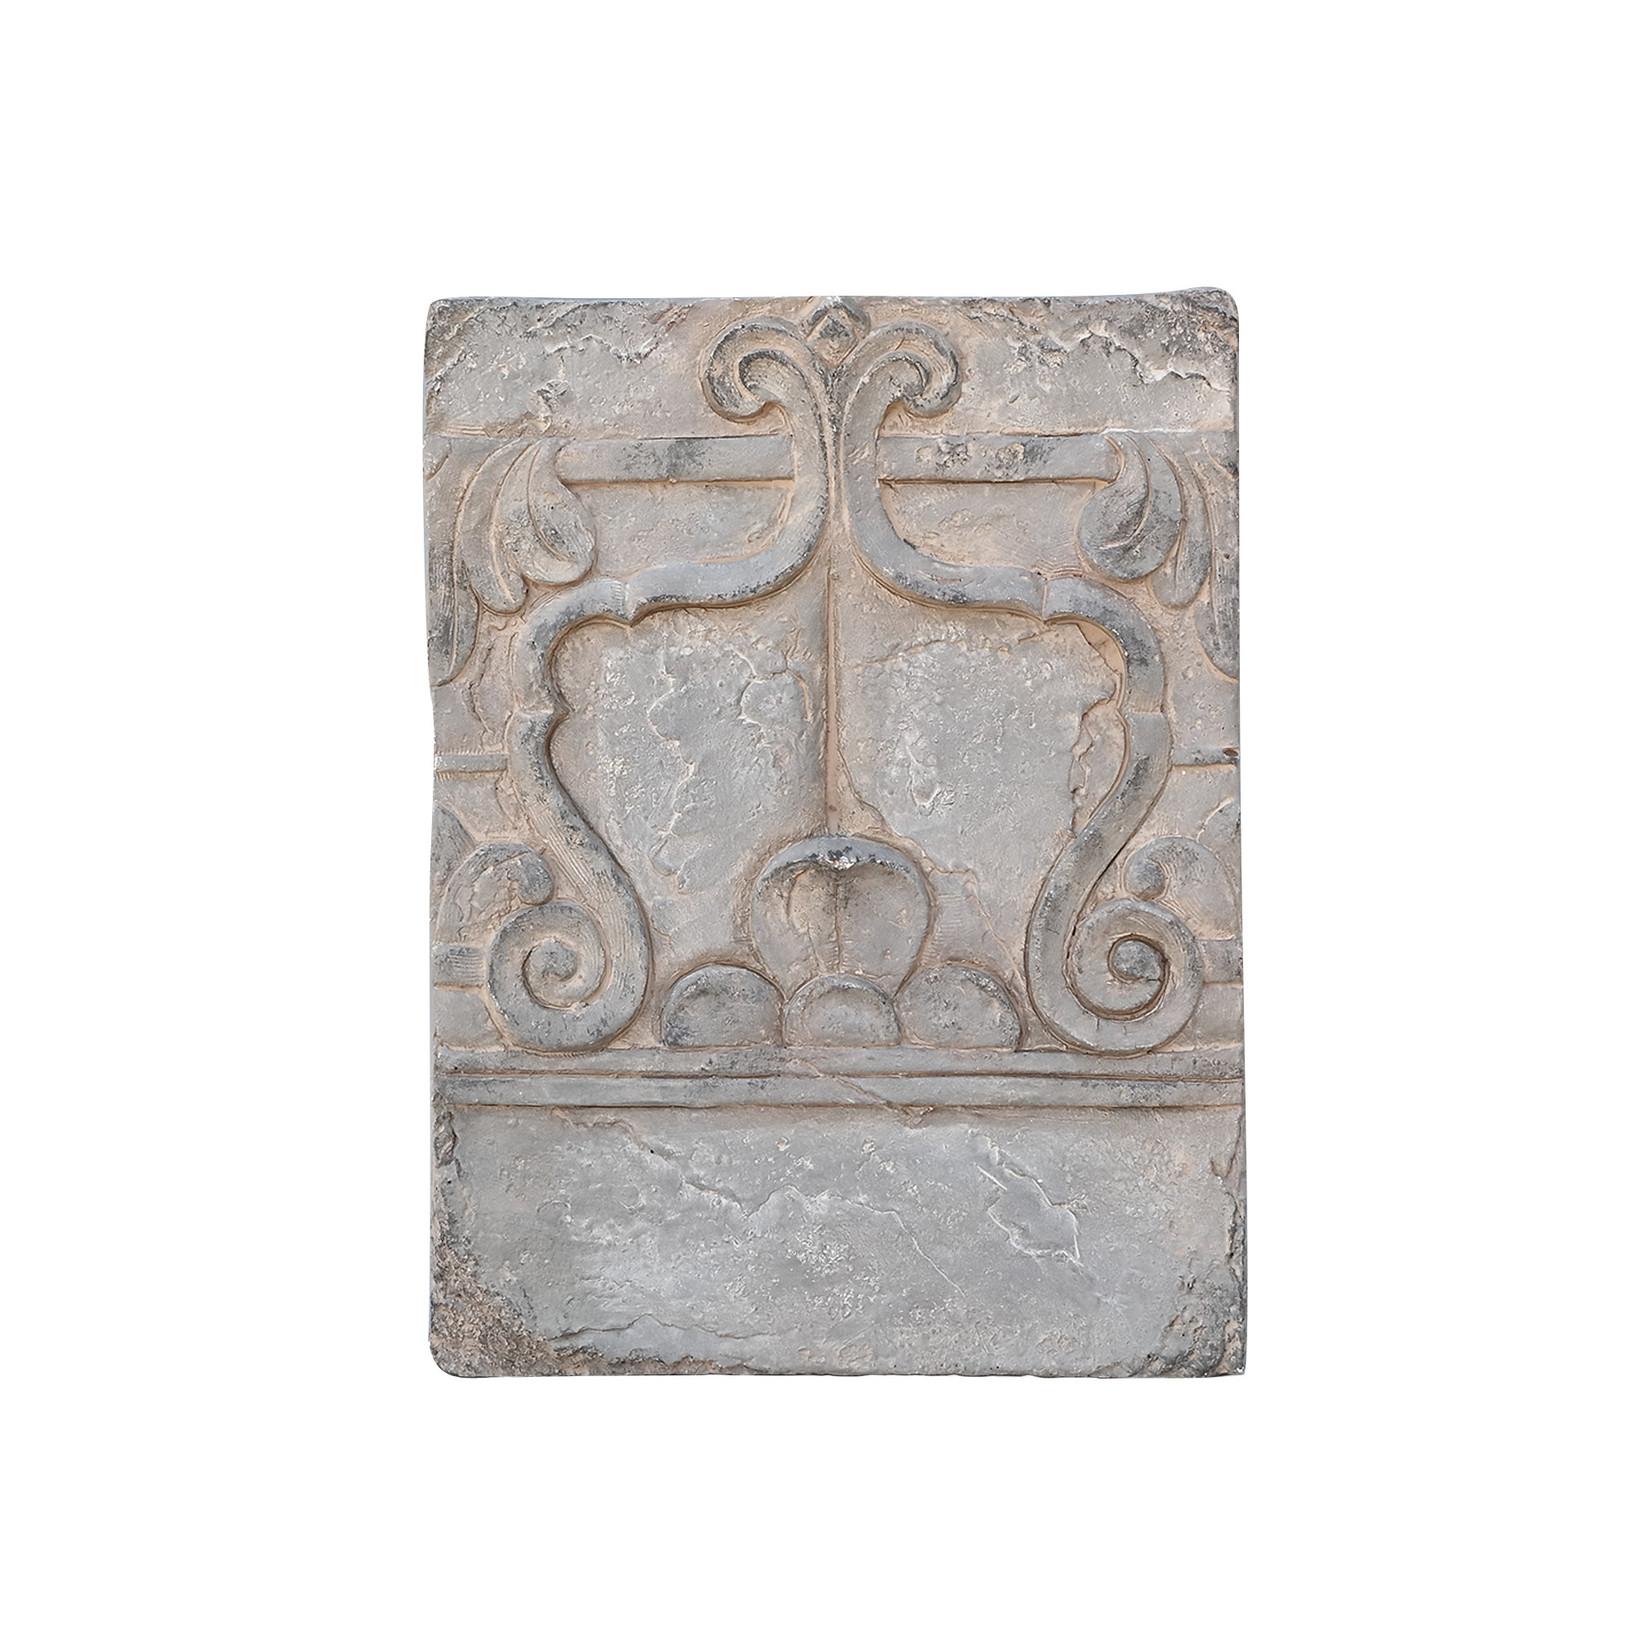 PTMD Gioia Grey stone fiberglass panel decorative S